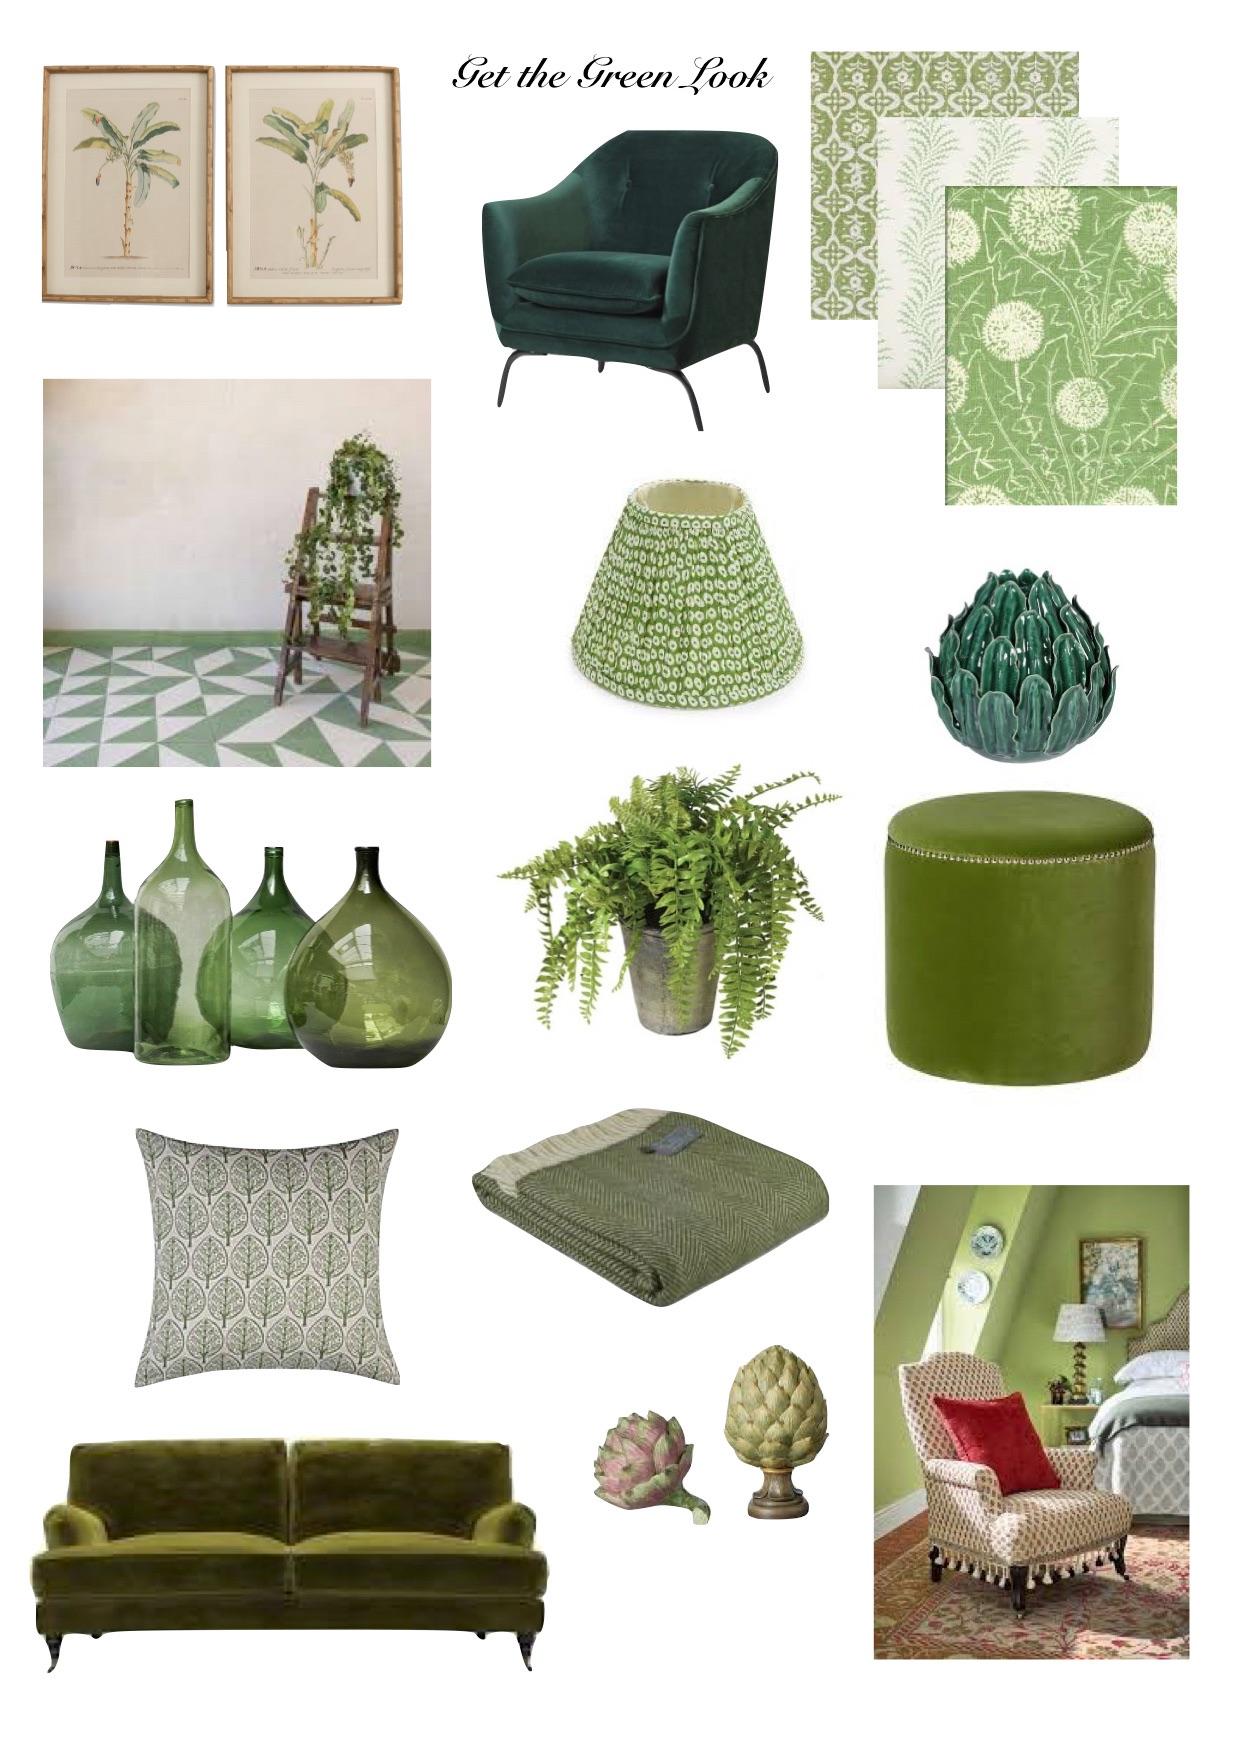 Get the green look, green interiors,green tiles,green textiles,calming interiors,